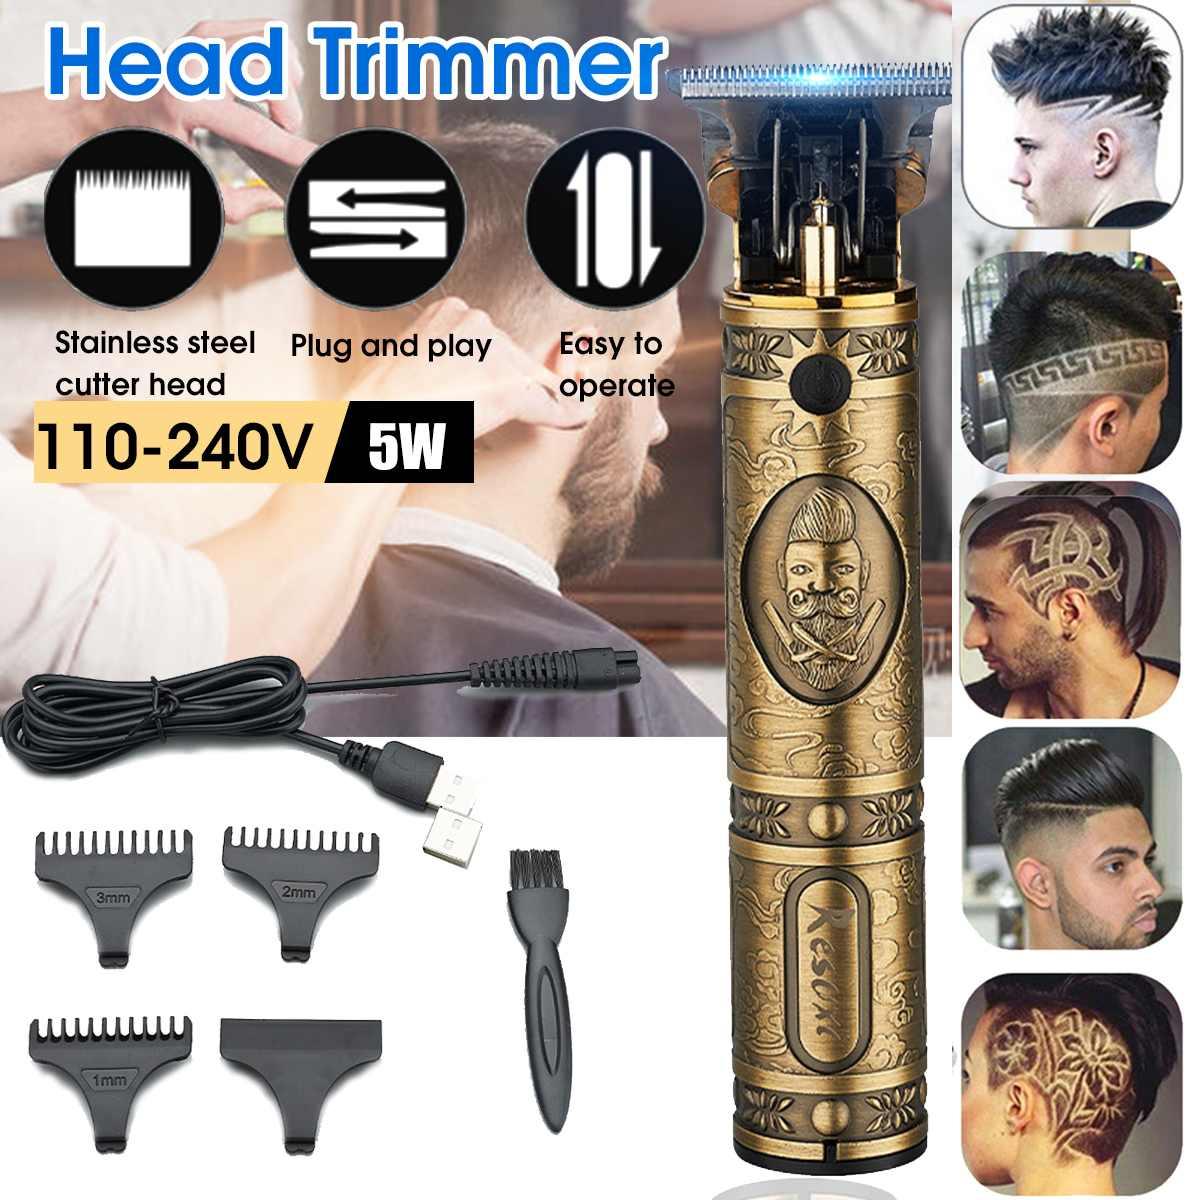 USB Rechargeable T9 Baldheaded Hair Clipper Electric hair trimmer Cordless Shaver Trimmer 0mm Men Barber Hair Cutting Machine недорого